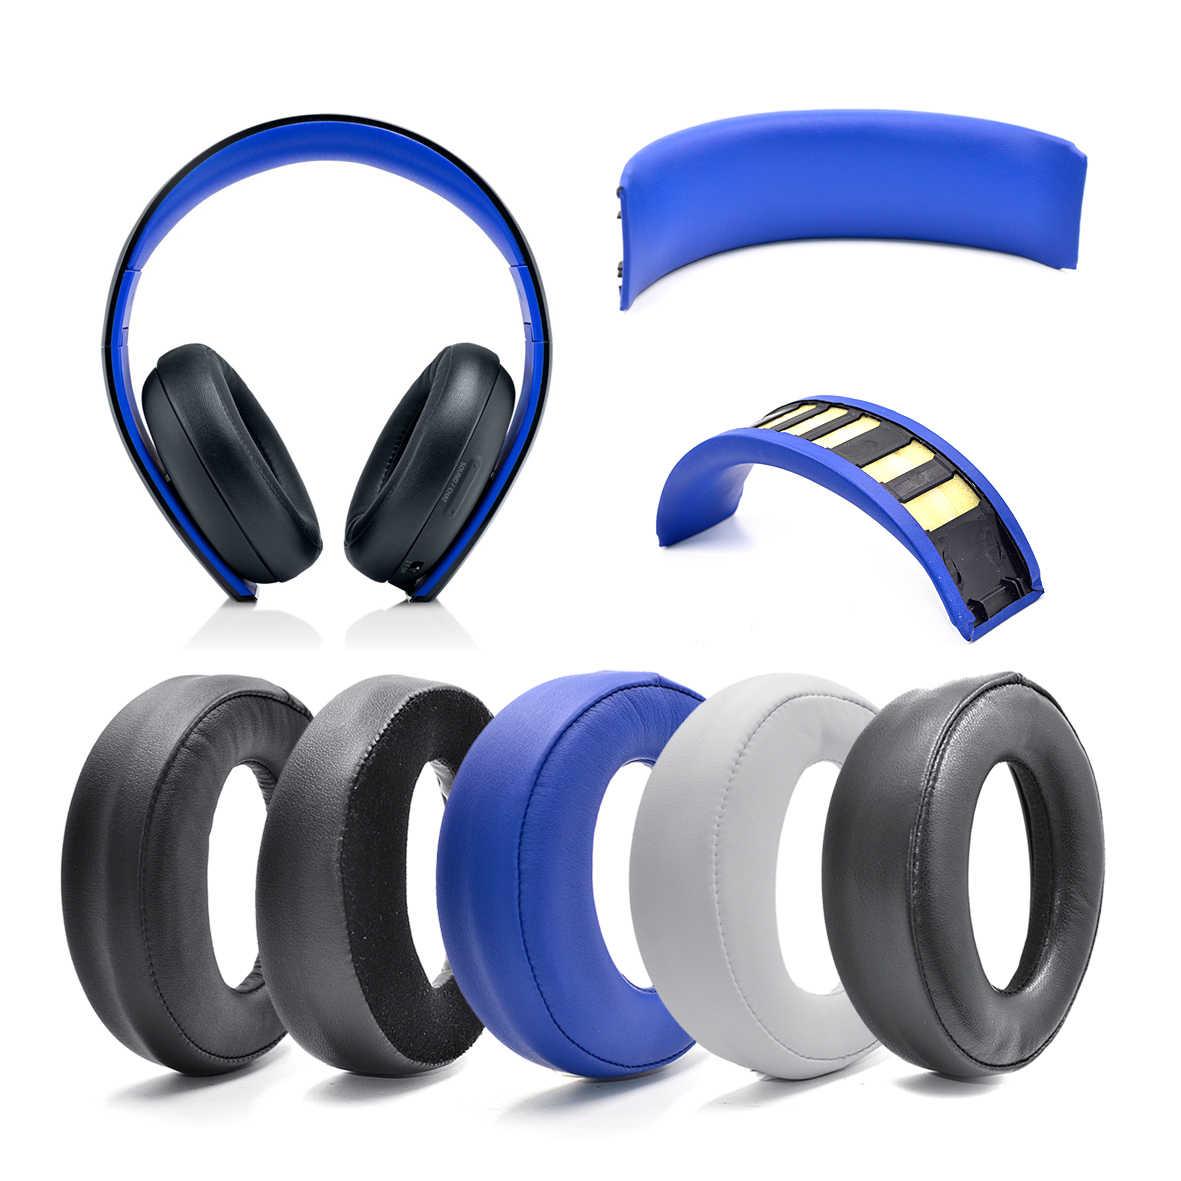 Earpads Ear Pads Cushion Headband Sheepskin Pads For Sony Playstation Ps3 Ps4 Ps Gold Wireless Cechya 0083 Stereo 7 1 Headphone Aliexpress